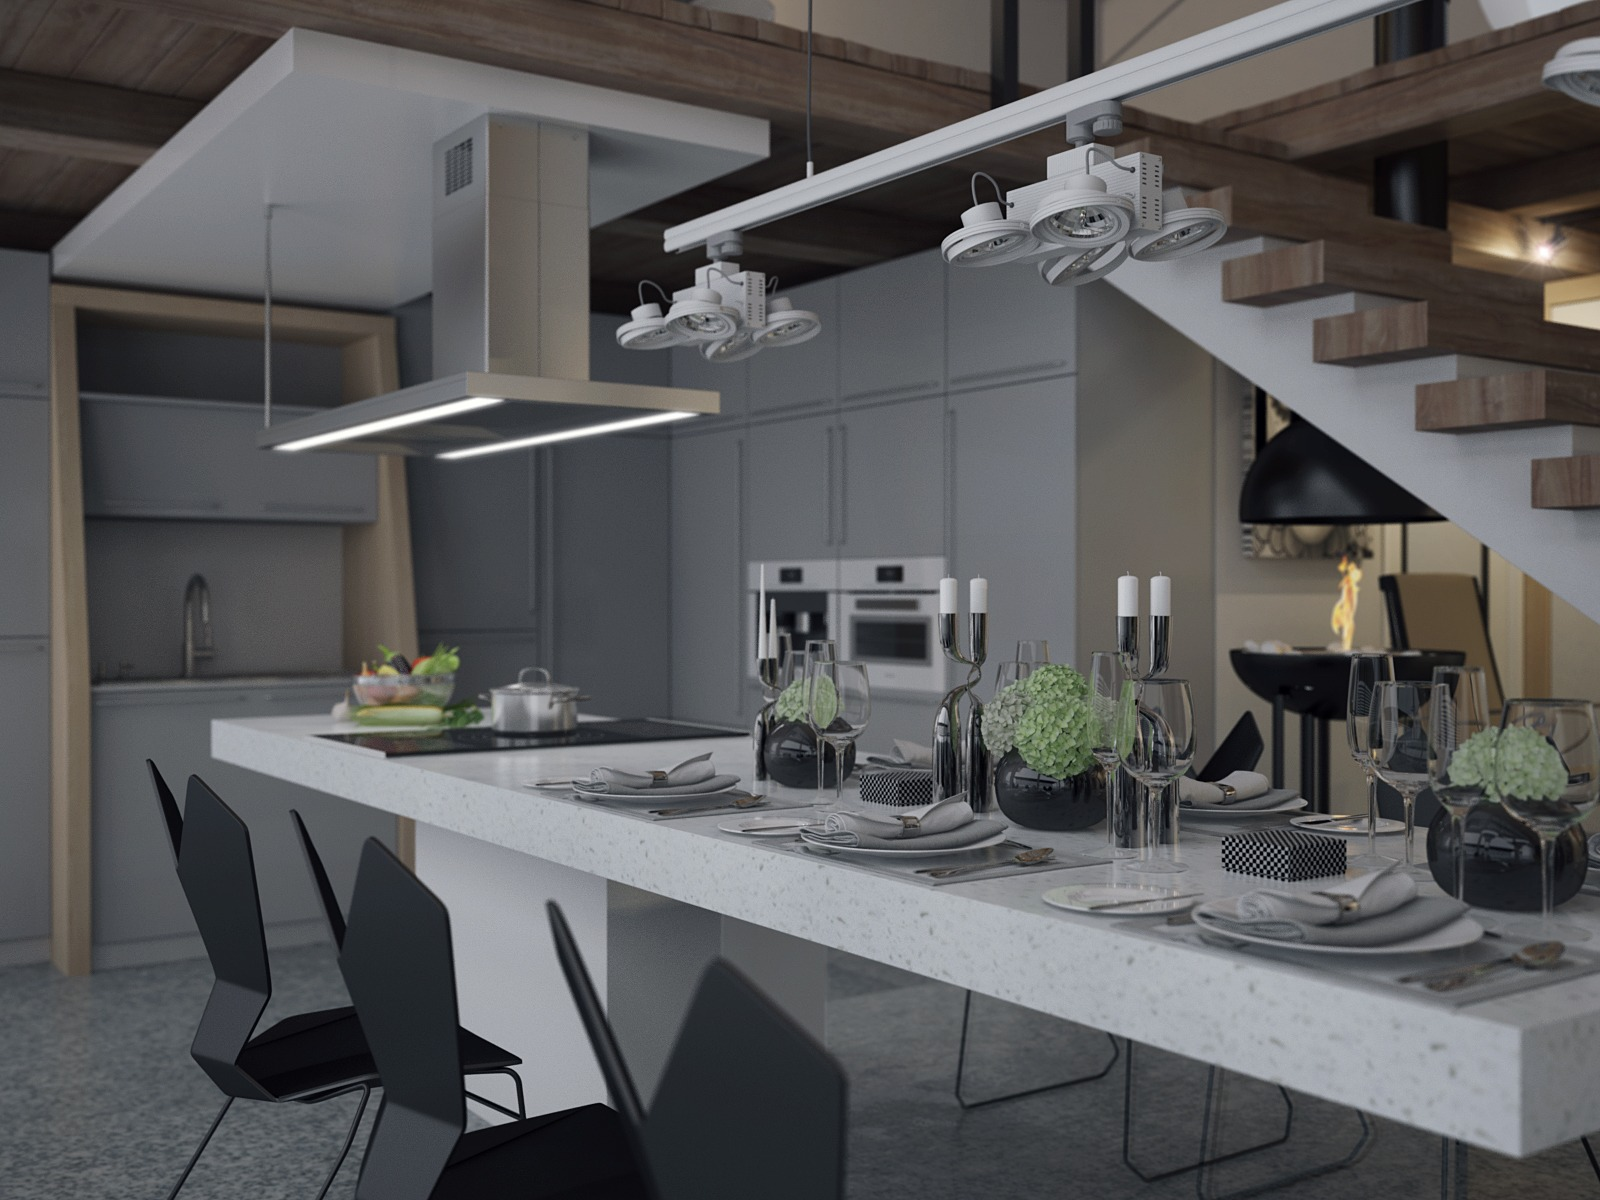 Unique black and white dining room decorating ideas